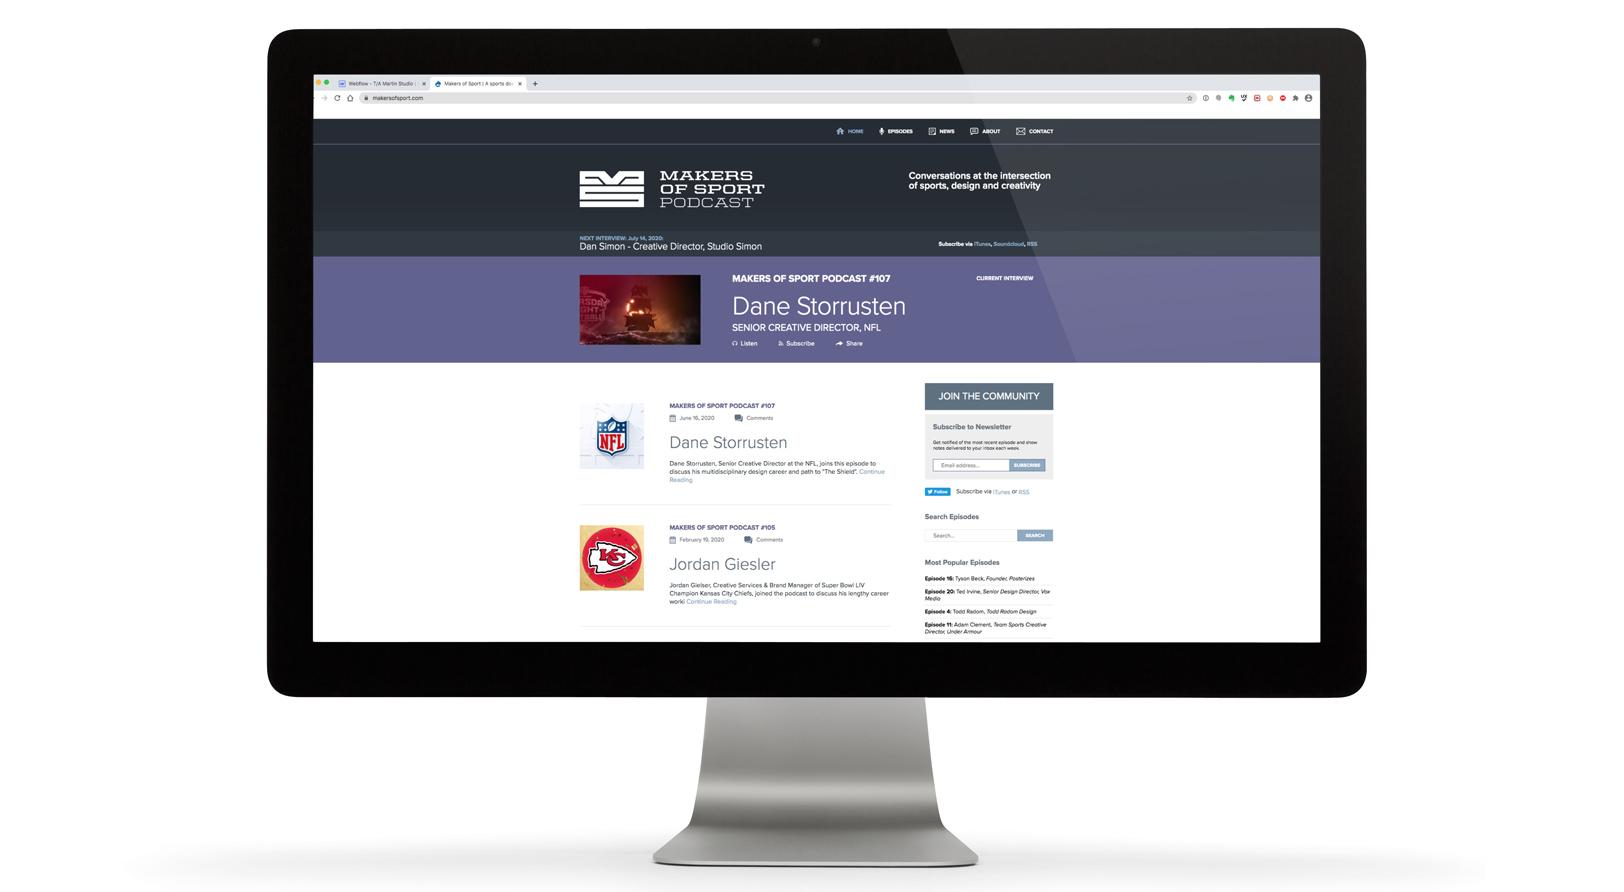 Makers of Sport® Website User Interface Design